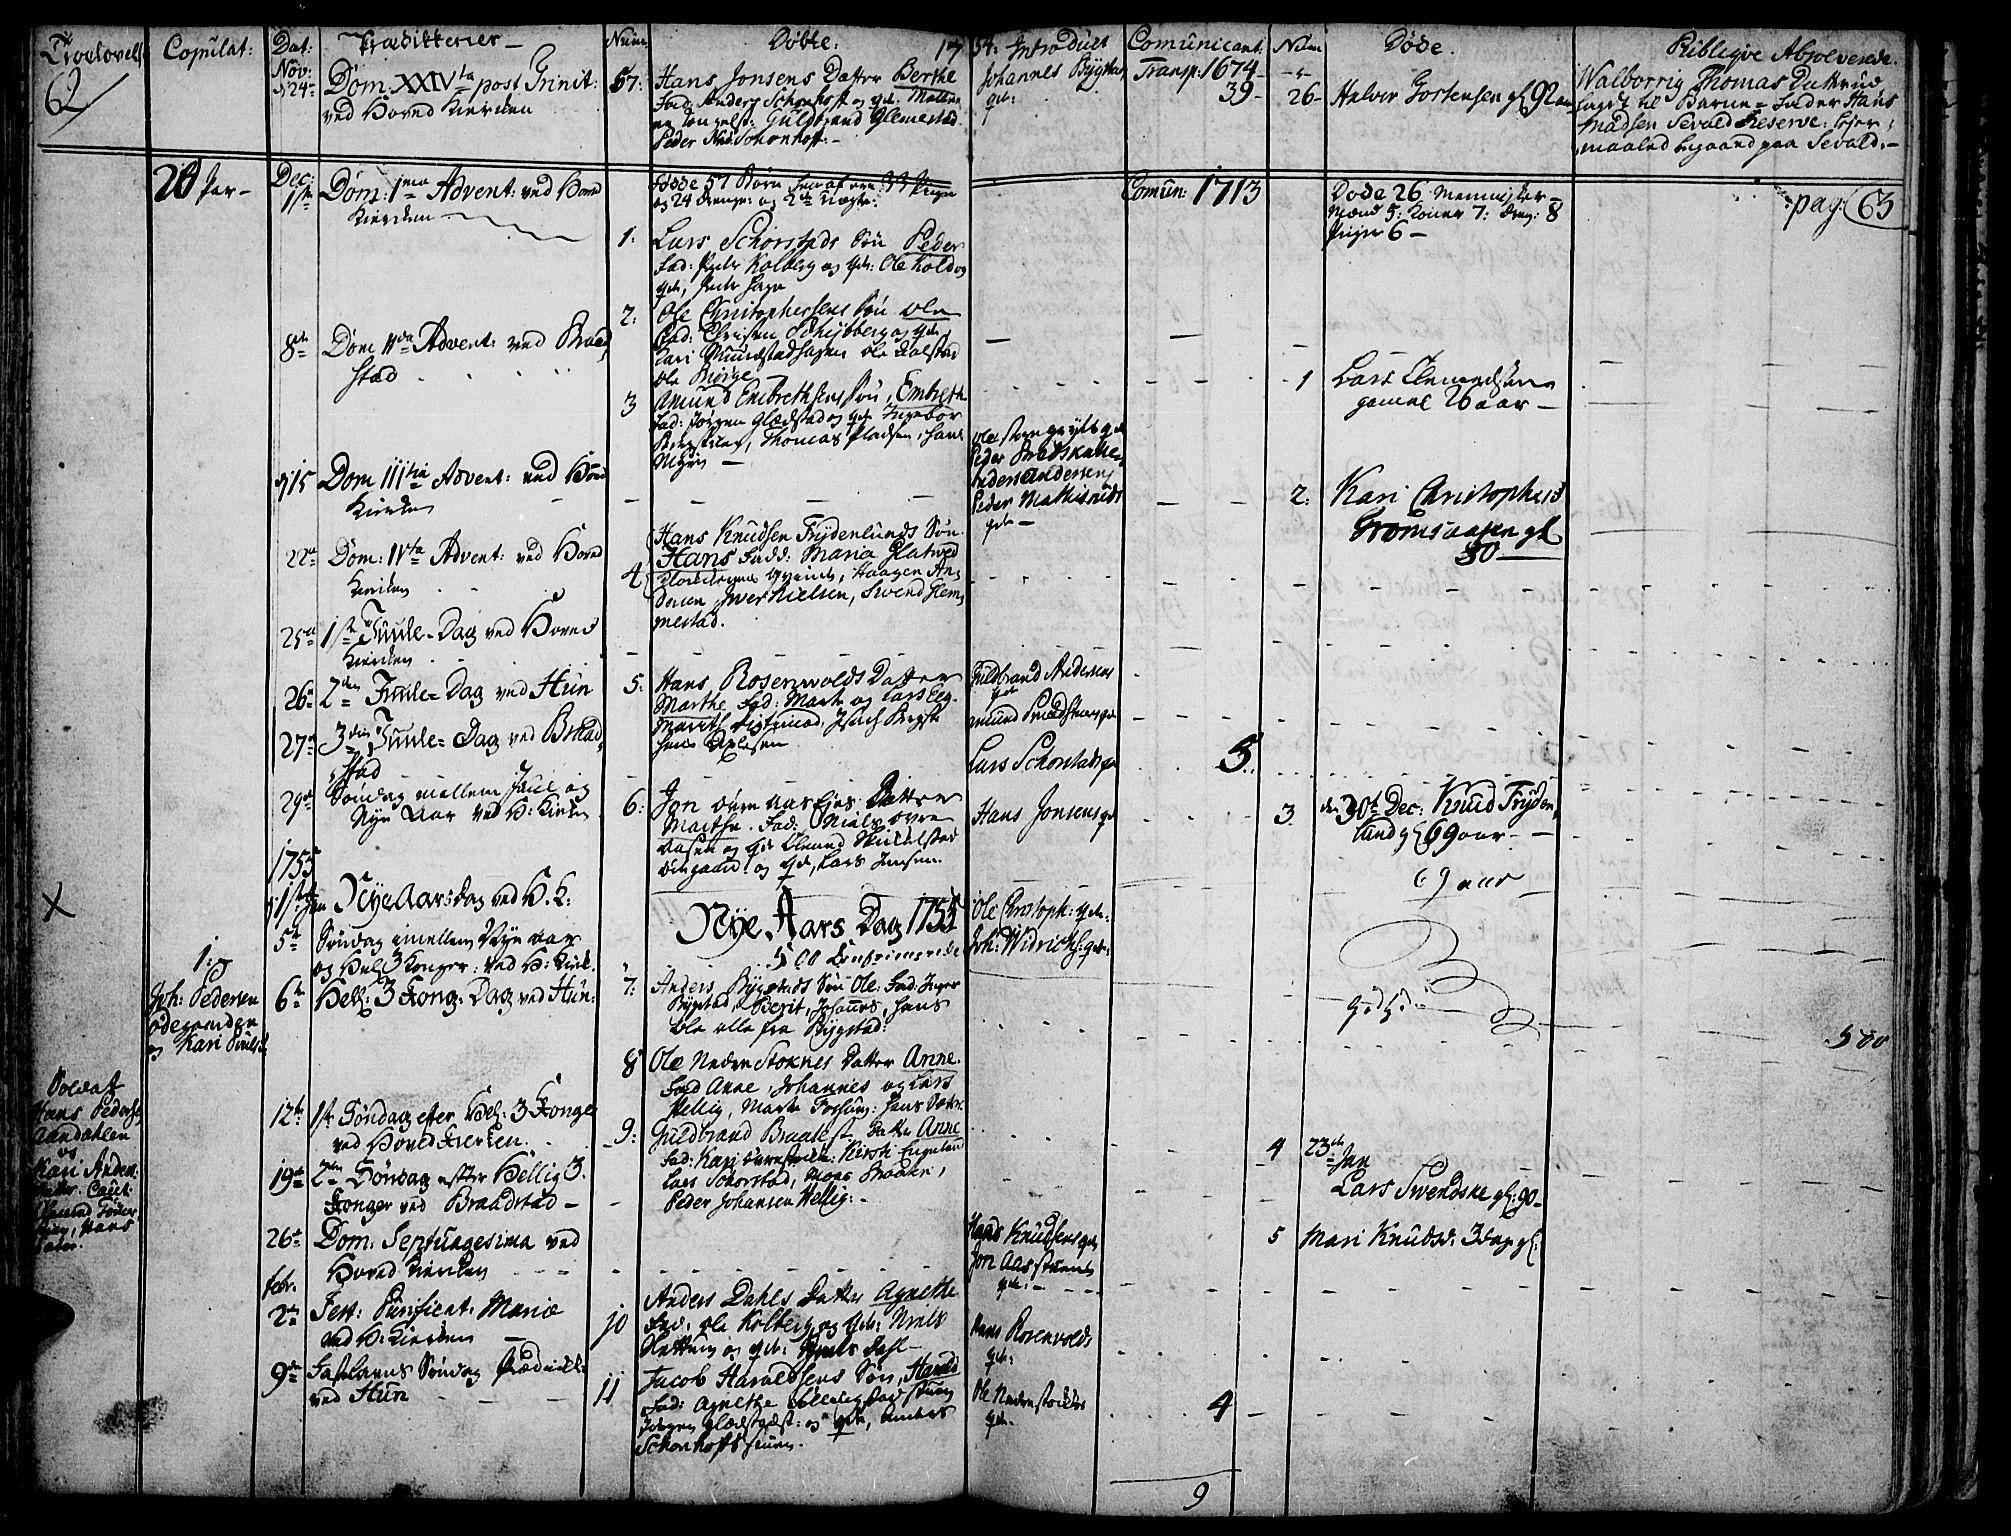 SAH, Vardal prestekontor, H/Ha/Haa/L0002: Ministerialbok nr. 2, 1748-1776, s. 62-63